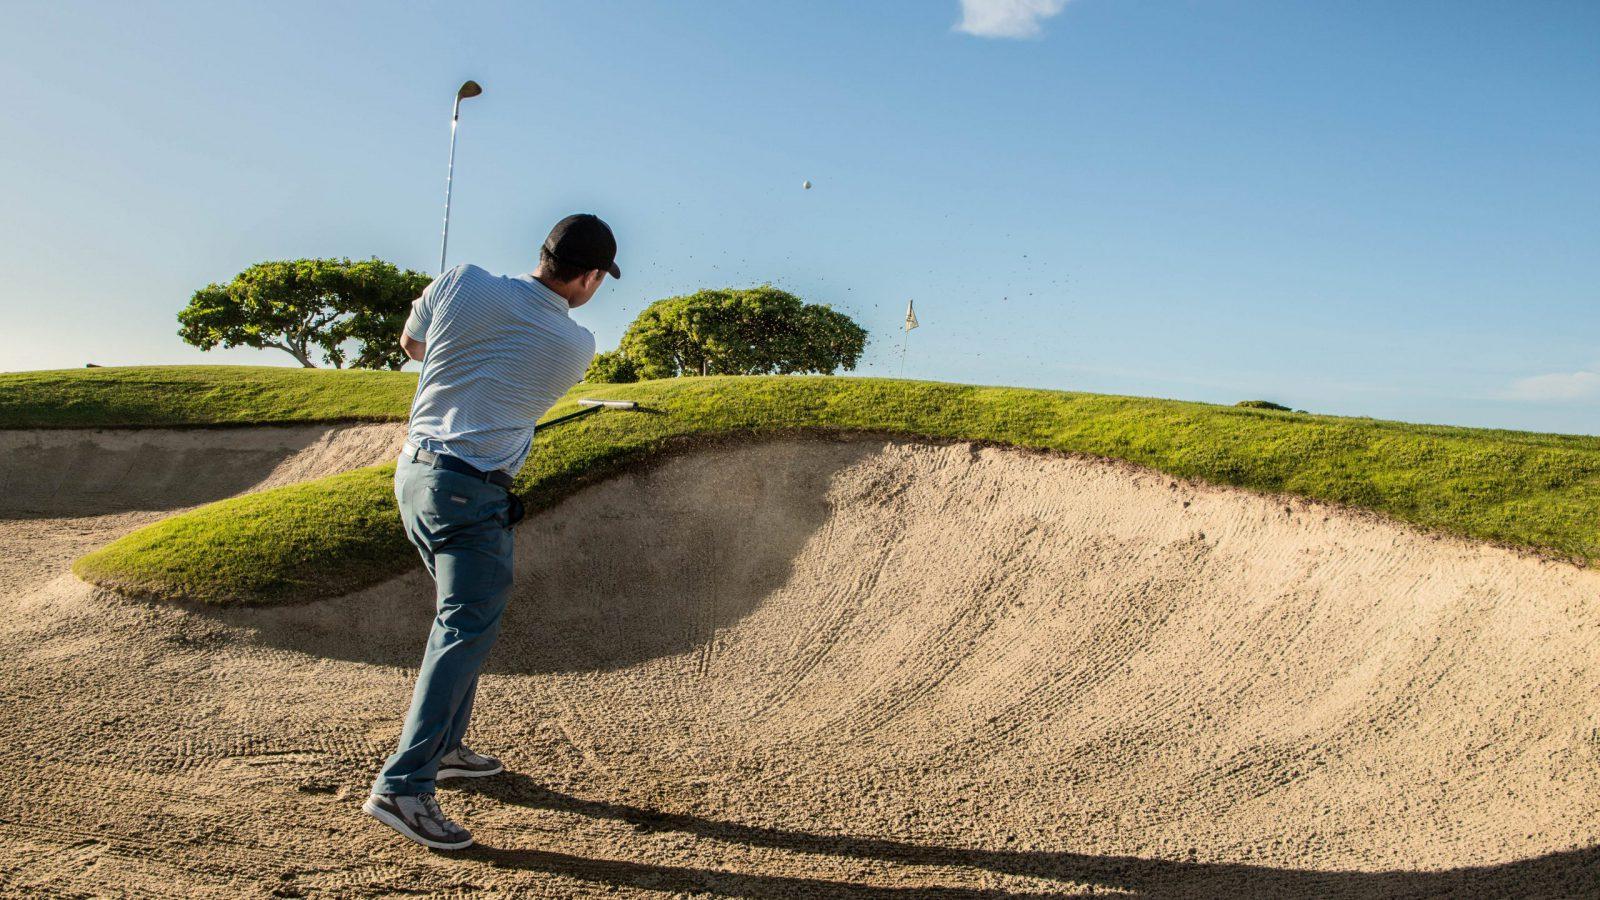 Golf Pro Garratt Okamura hits ball out of sand trap on course